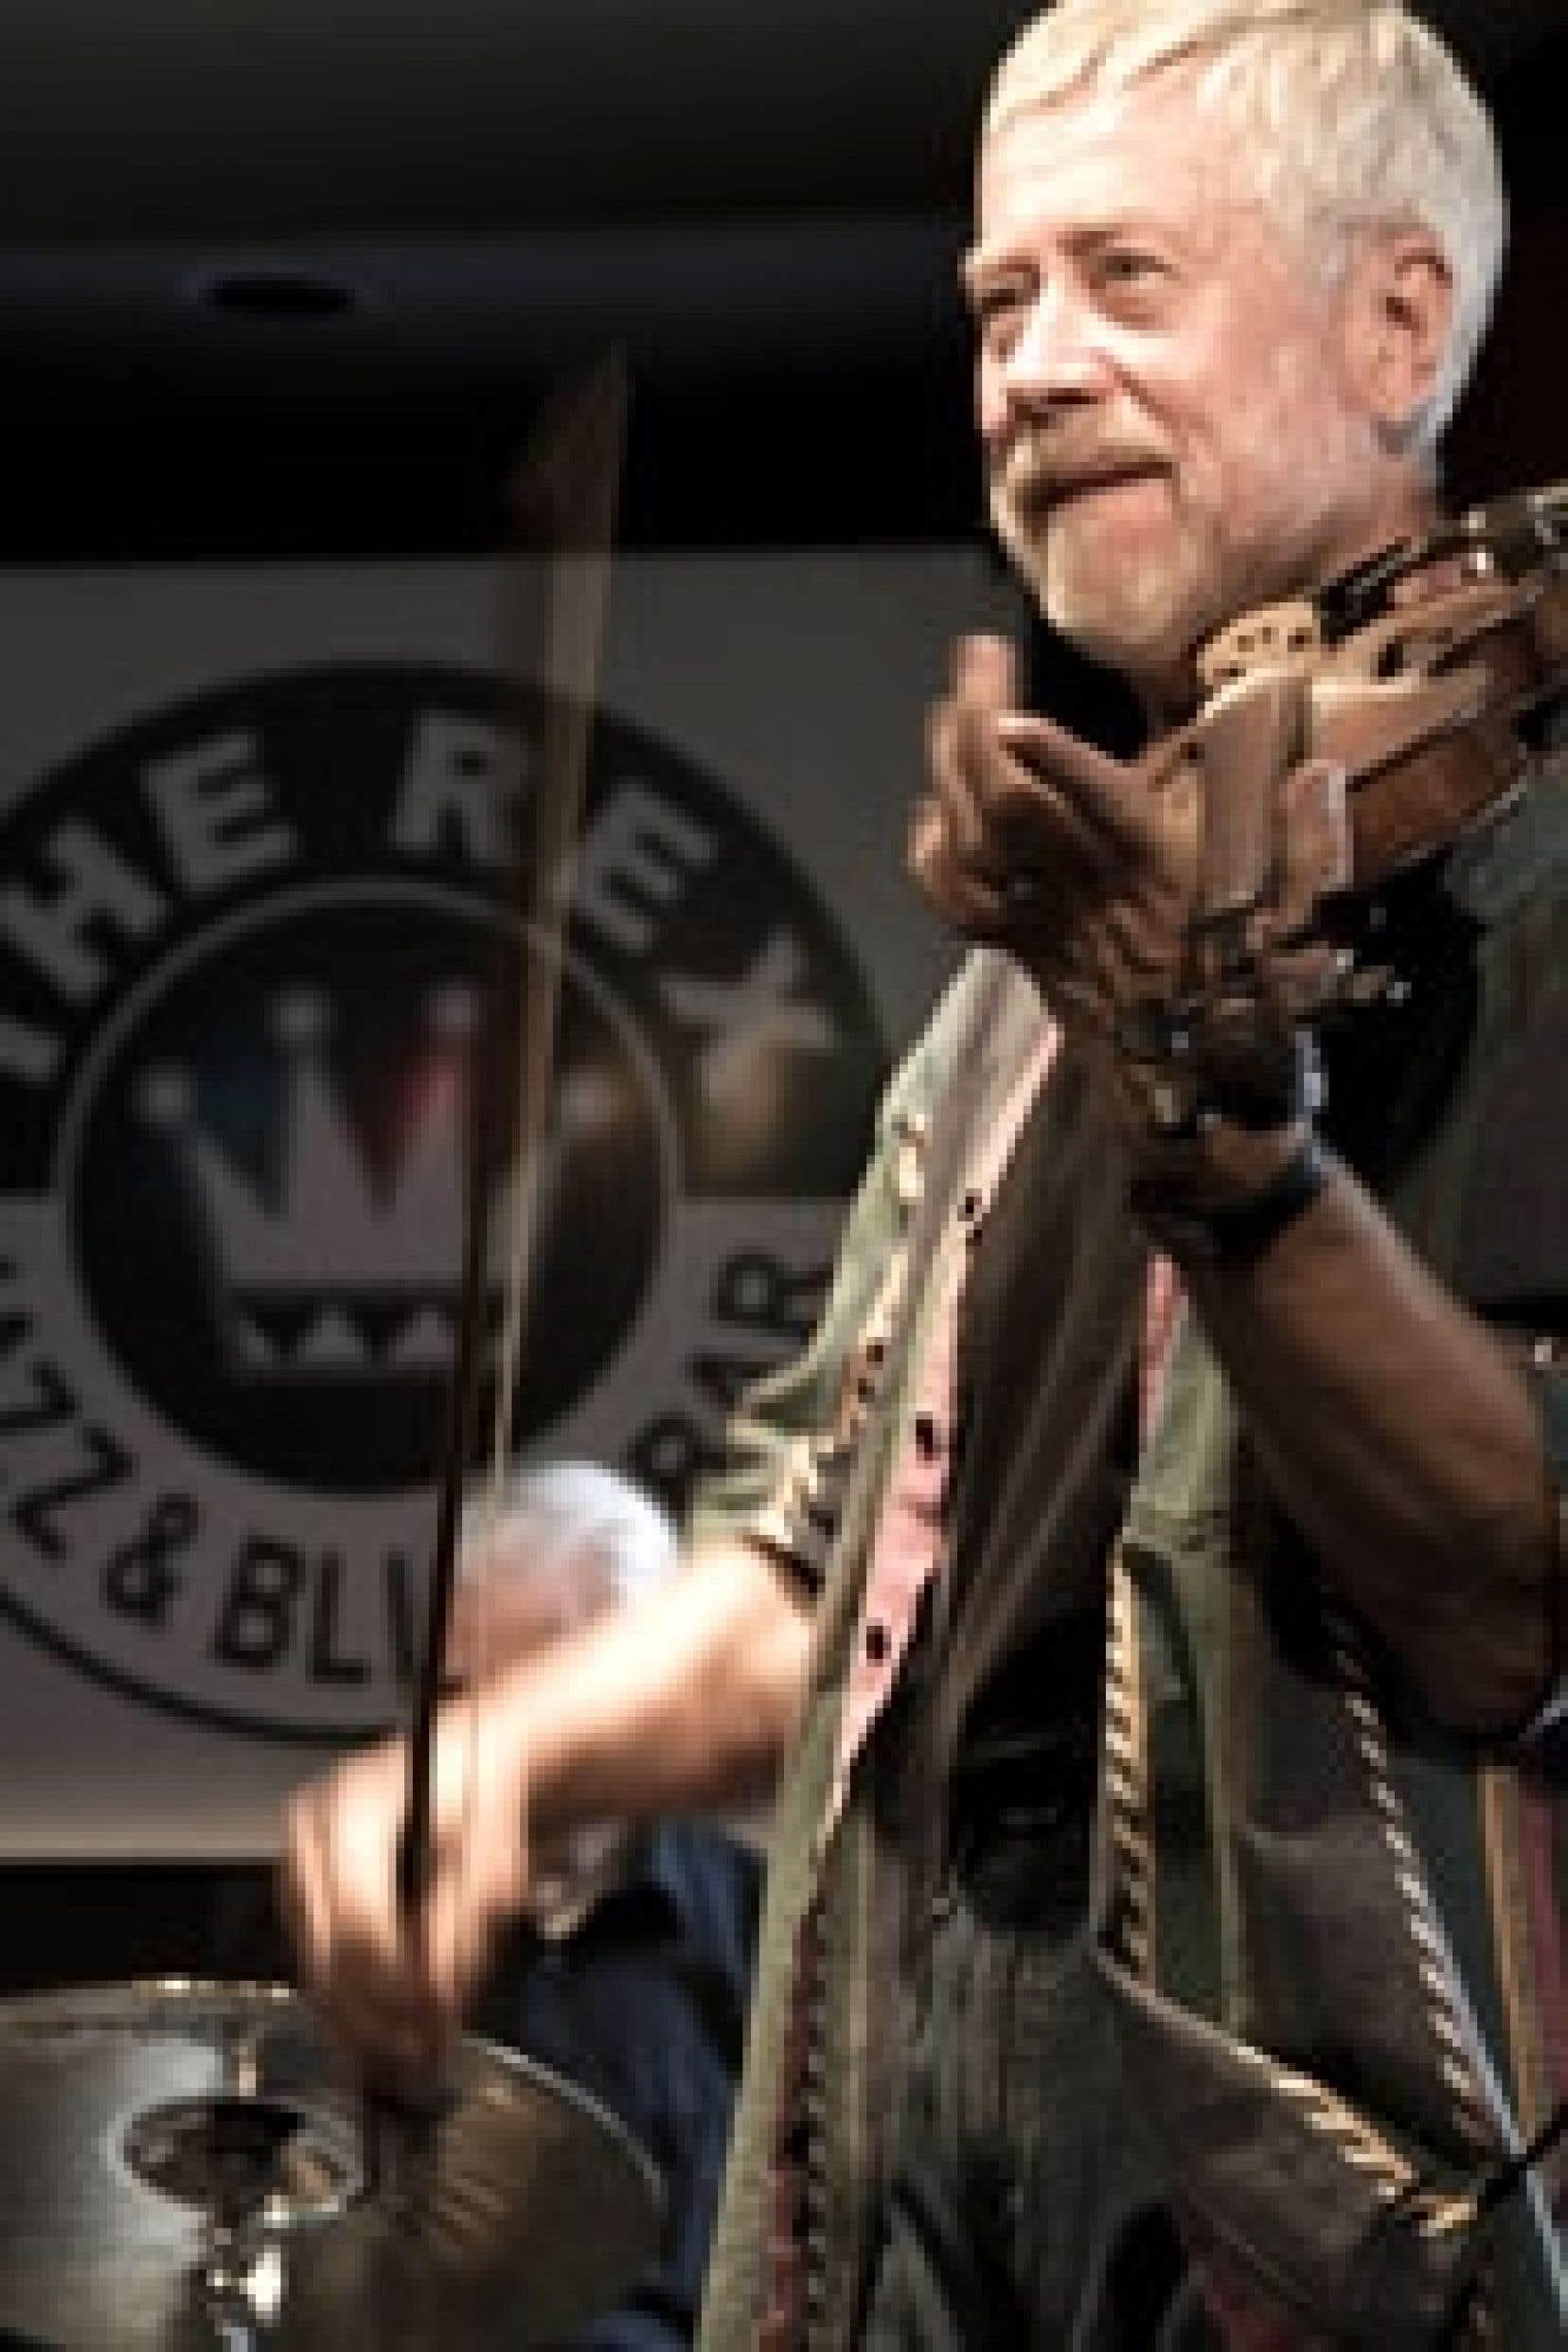 Jazz convivial au bar The Rex, un standard de la rue Queen. Source: Claude André